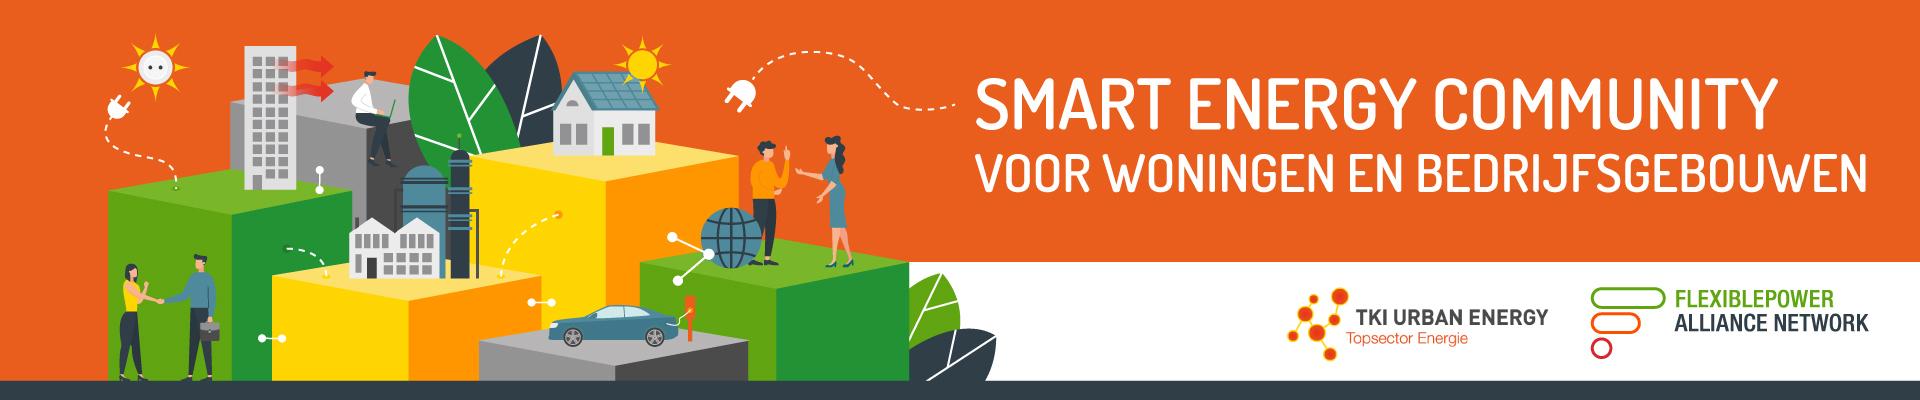 Smart Energy Community4